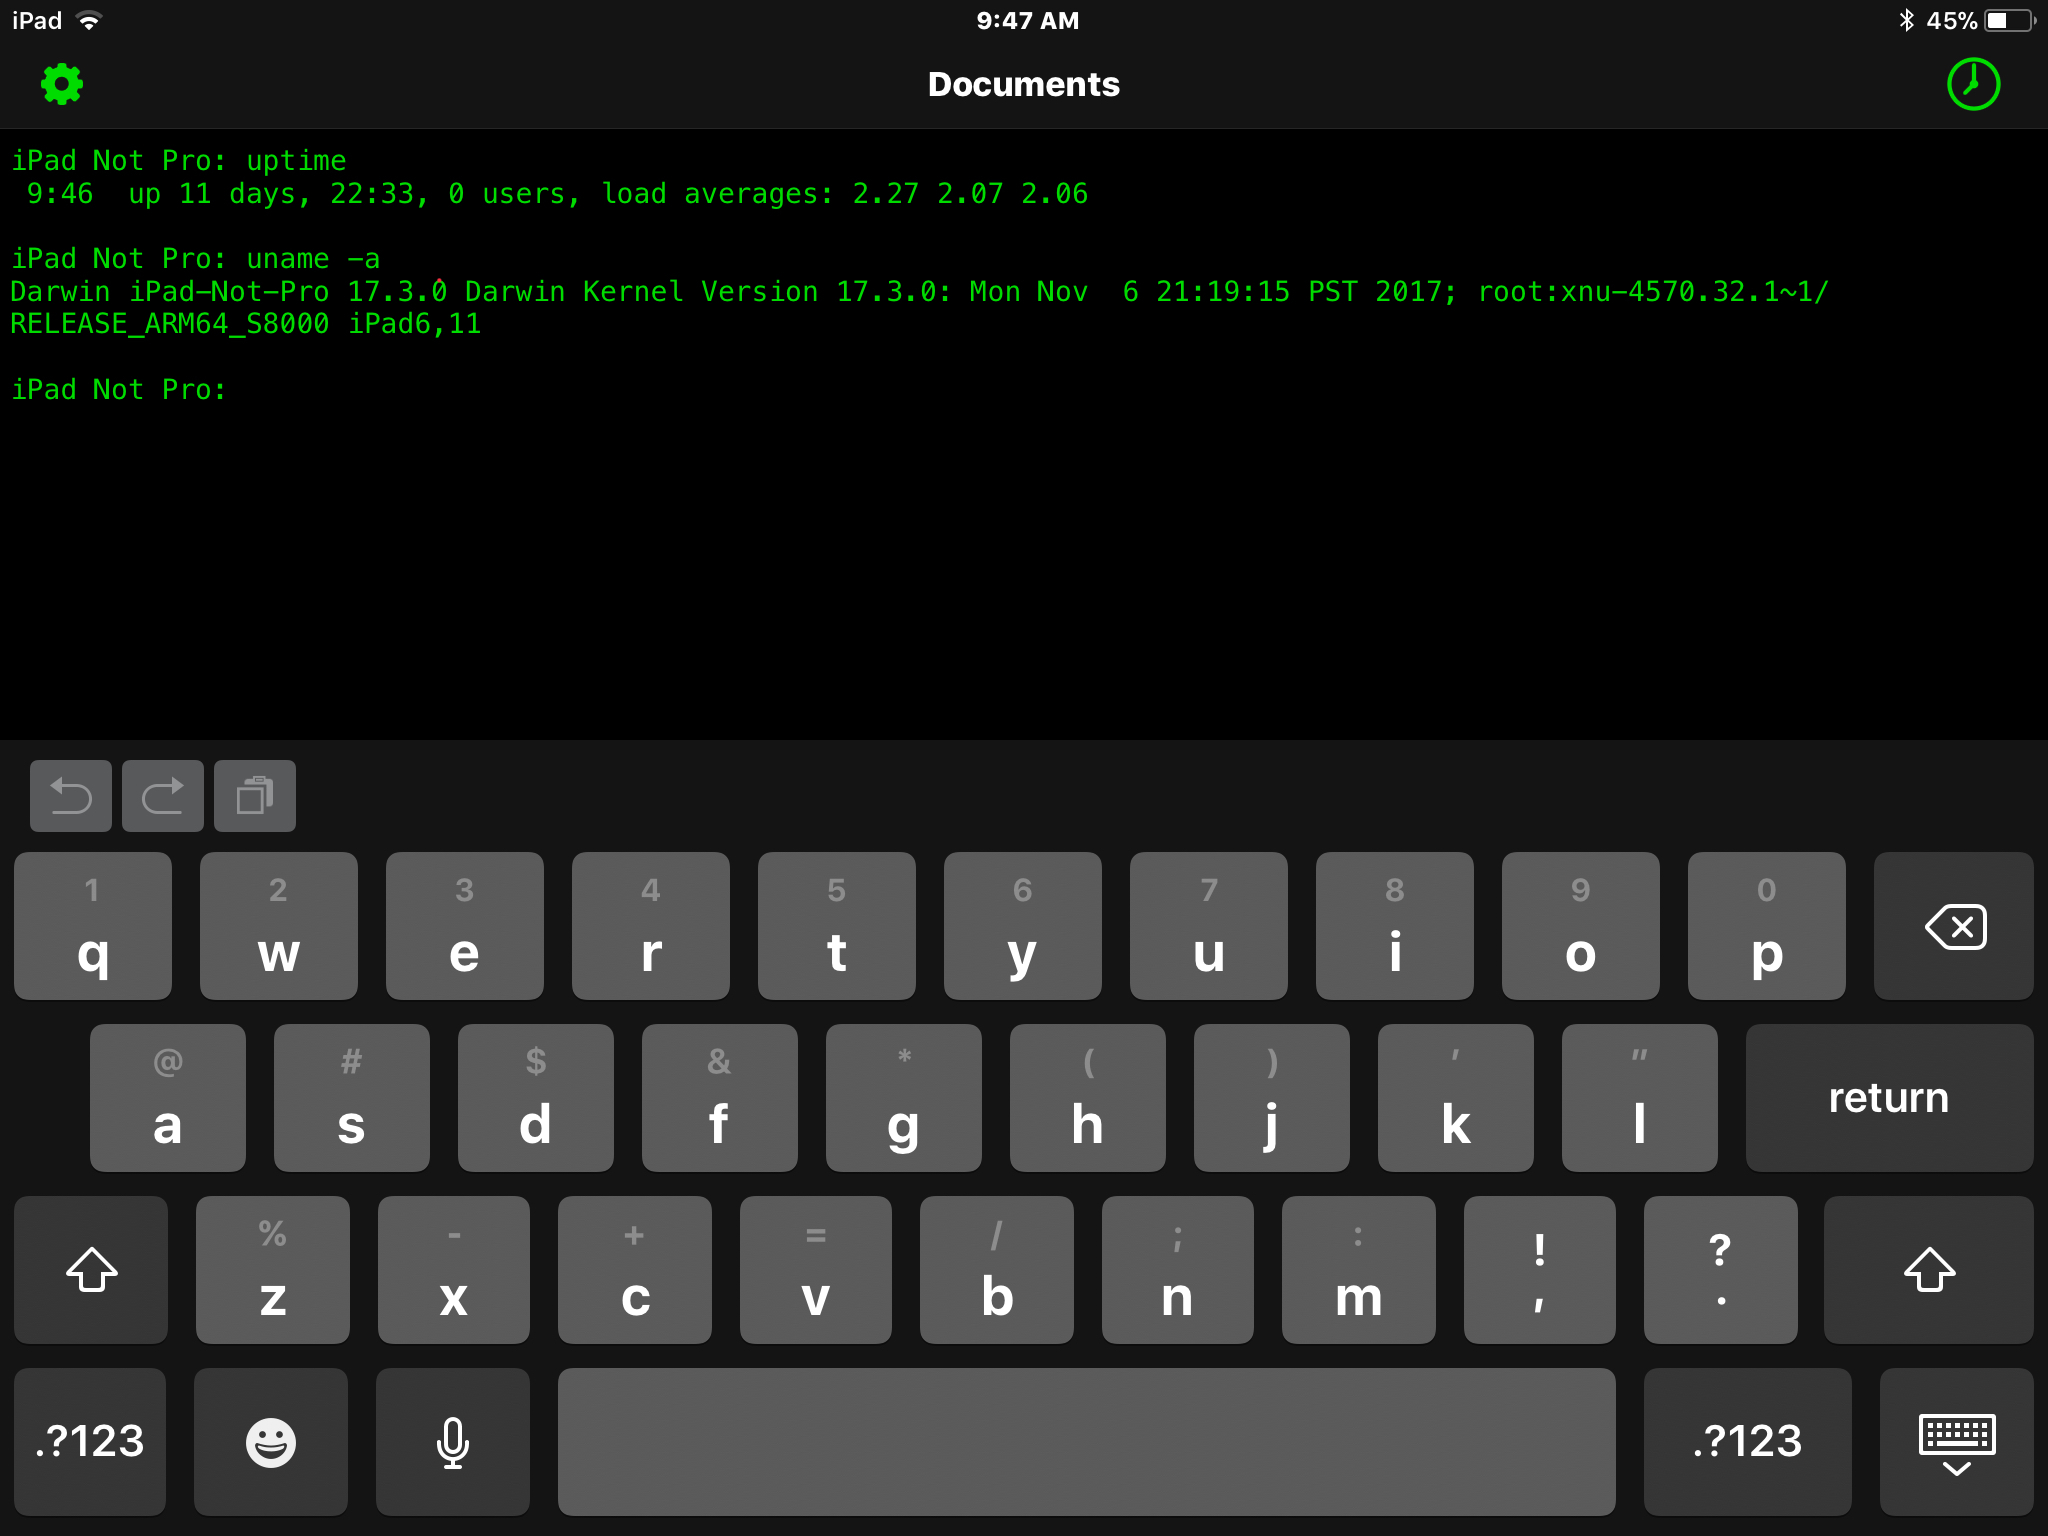 Ottieni uptime da OpenTerm in iOS